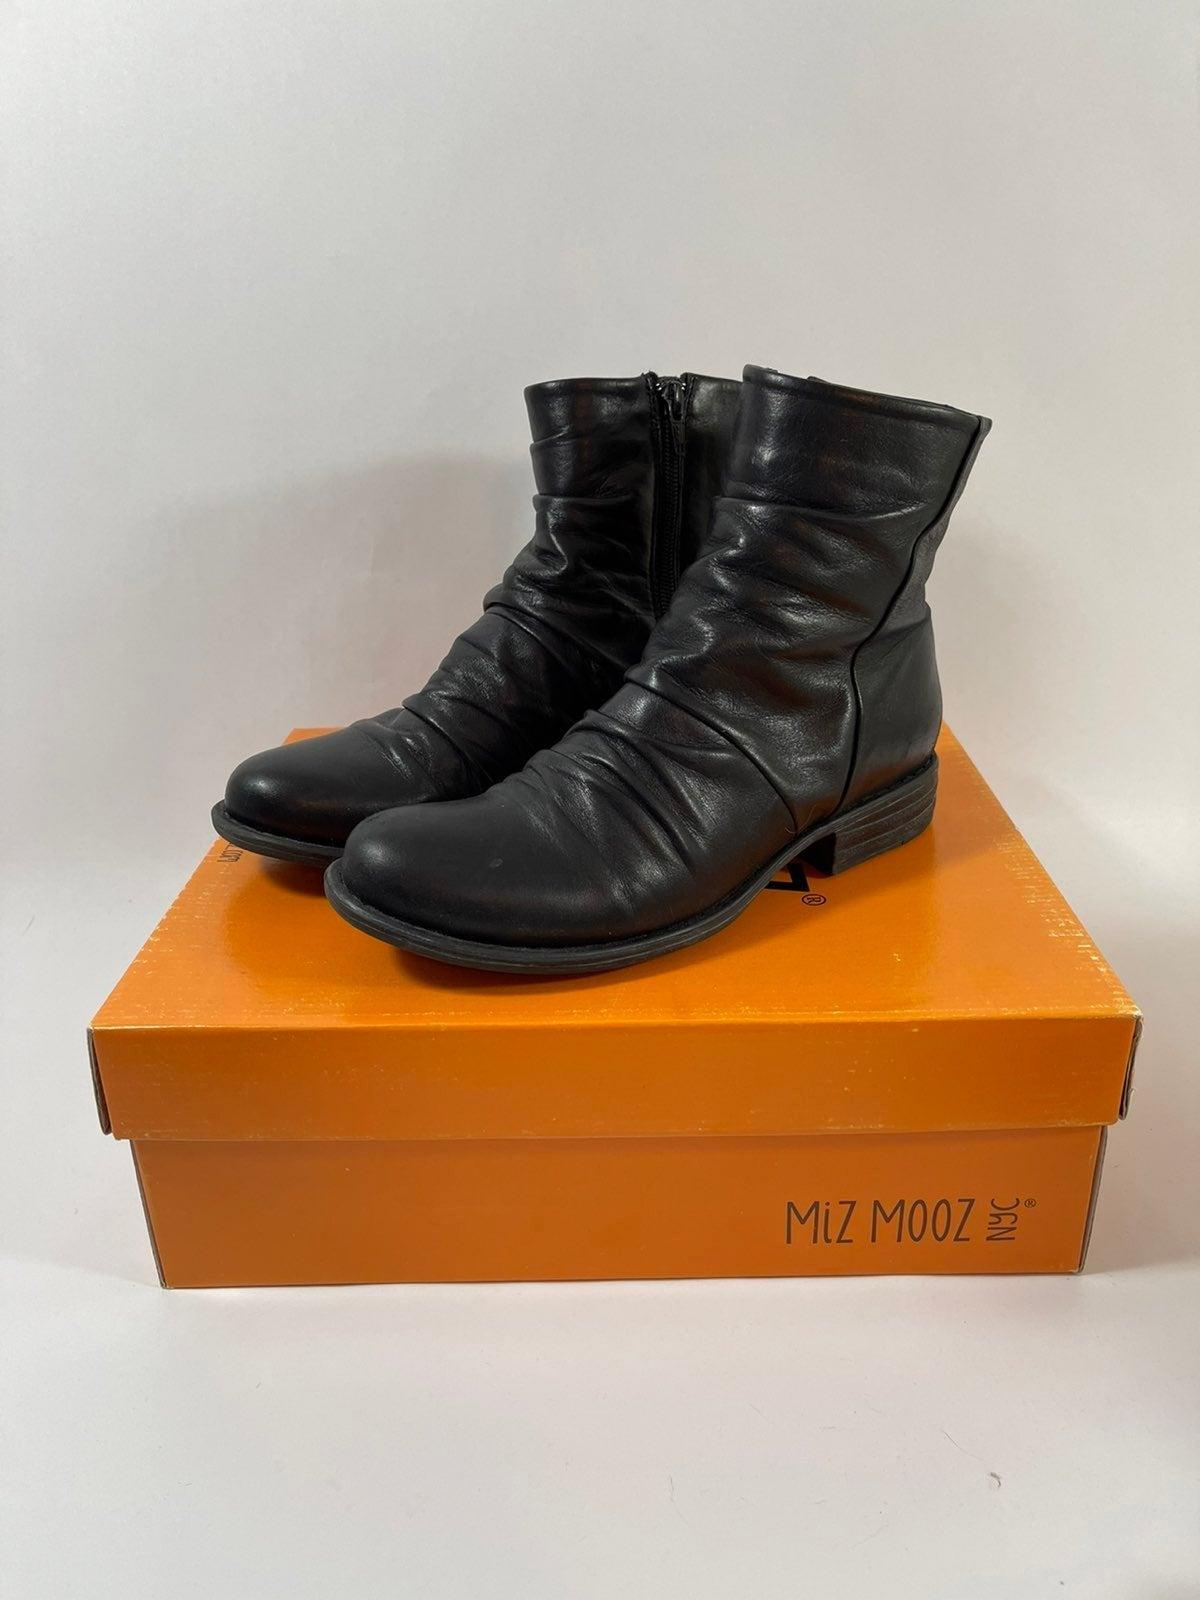 Miz Mooz Leather Booties